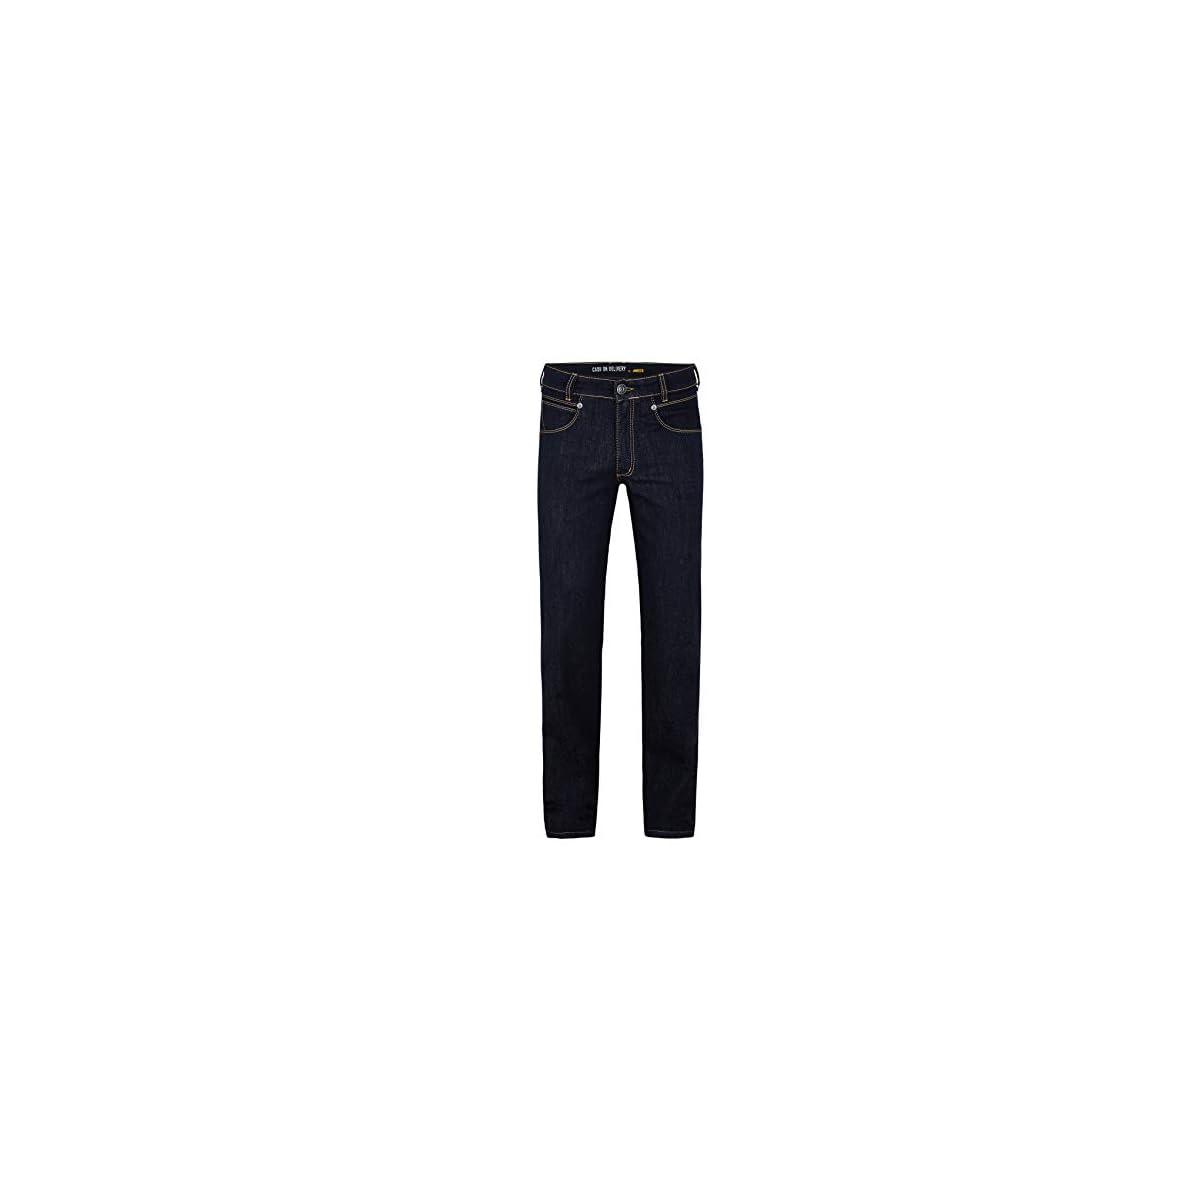 Joker Jeans Freddy 2521 Black Denim Stretch